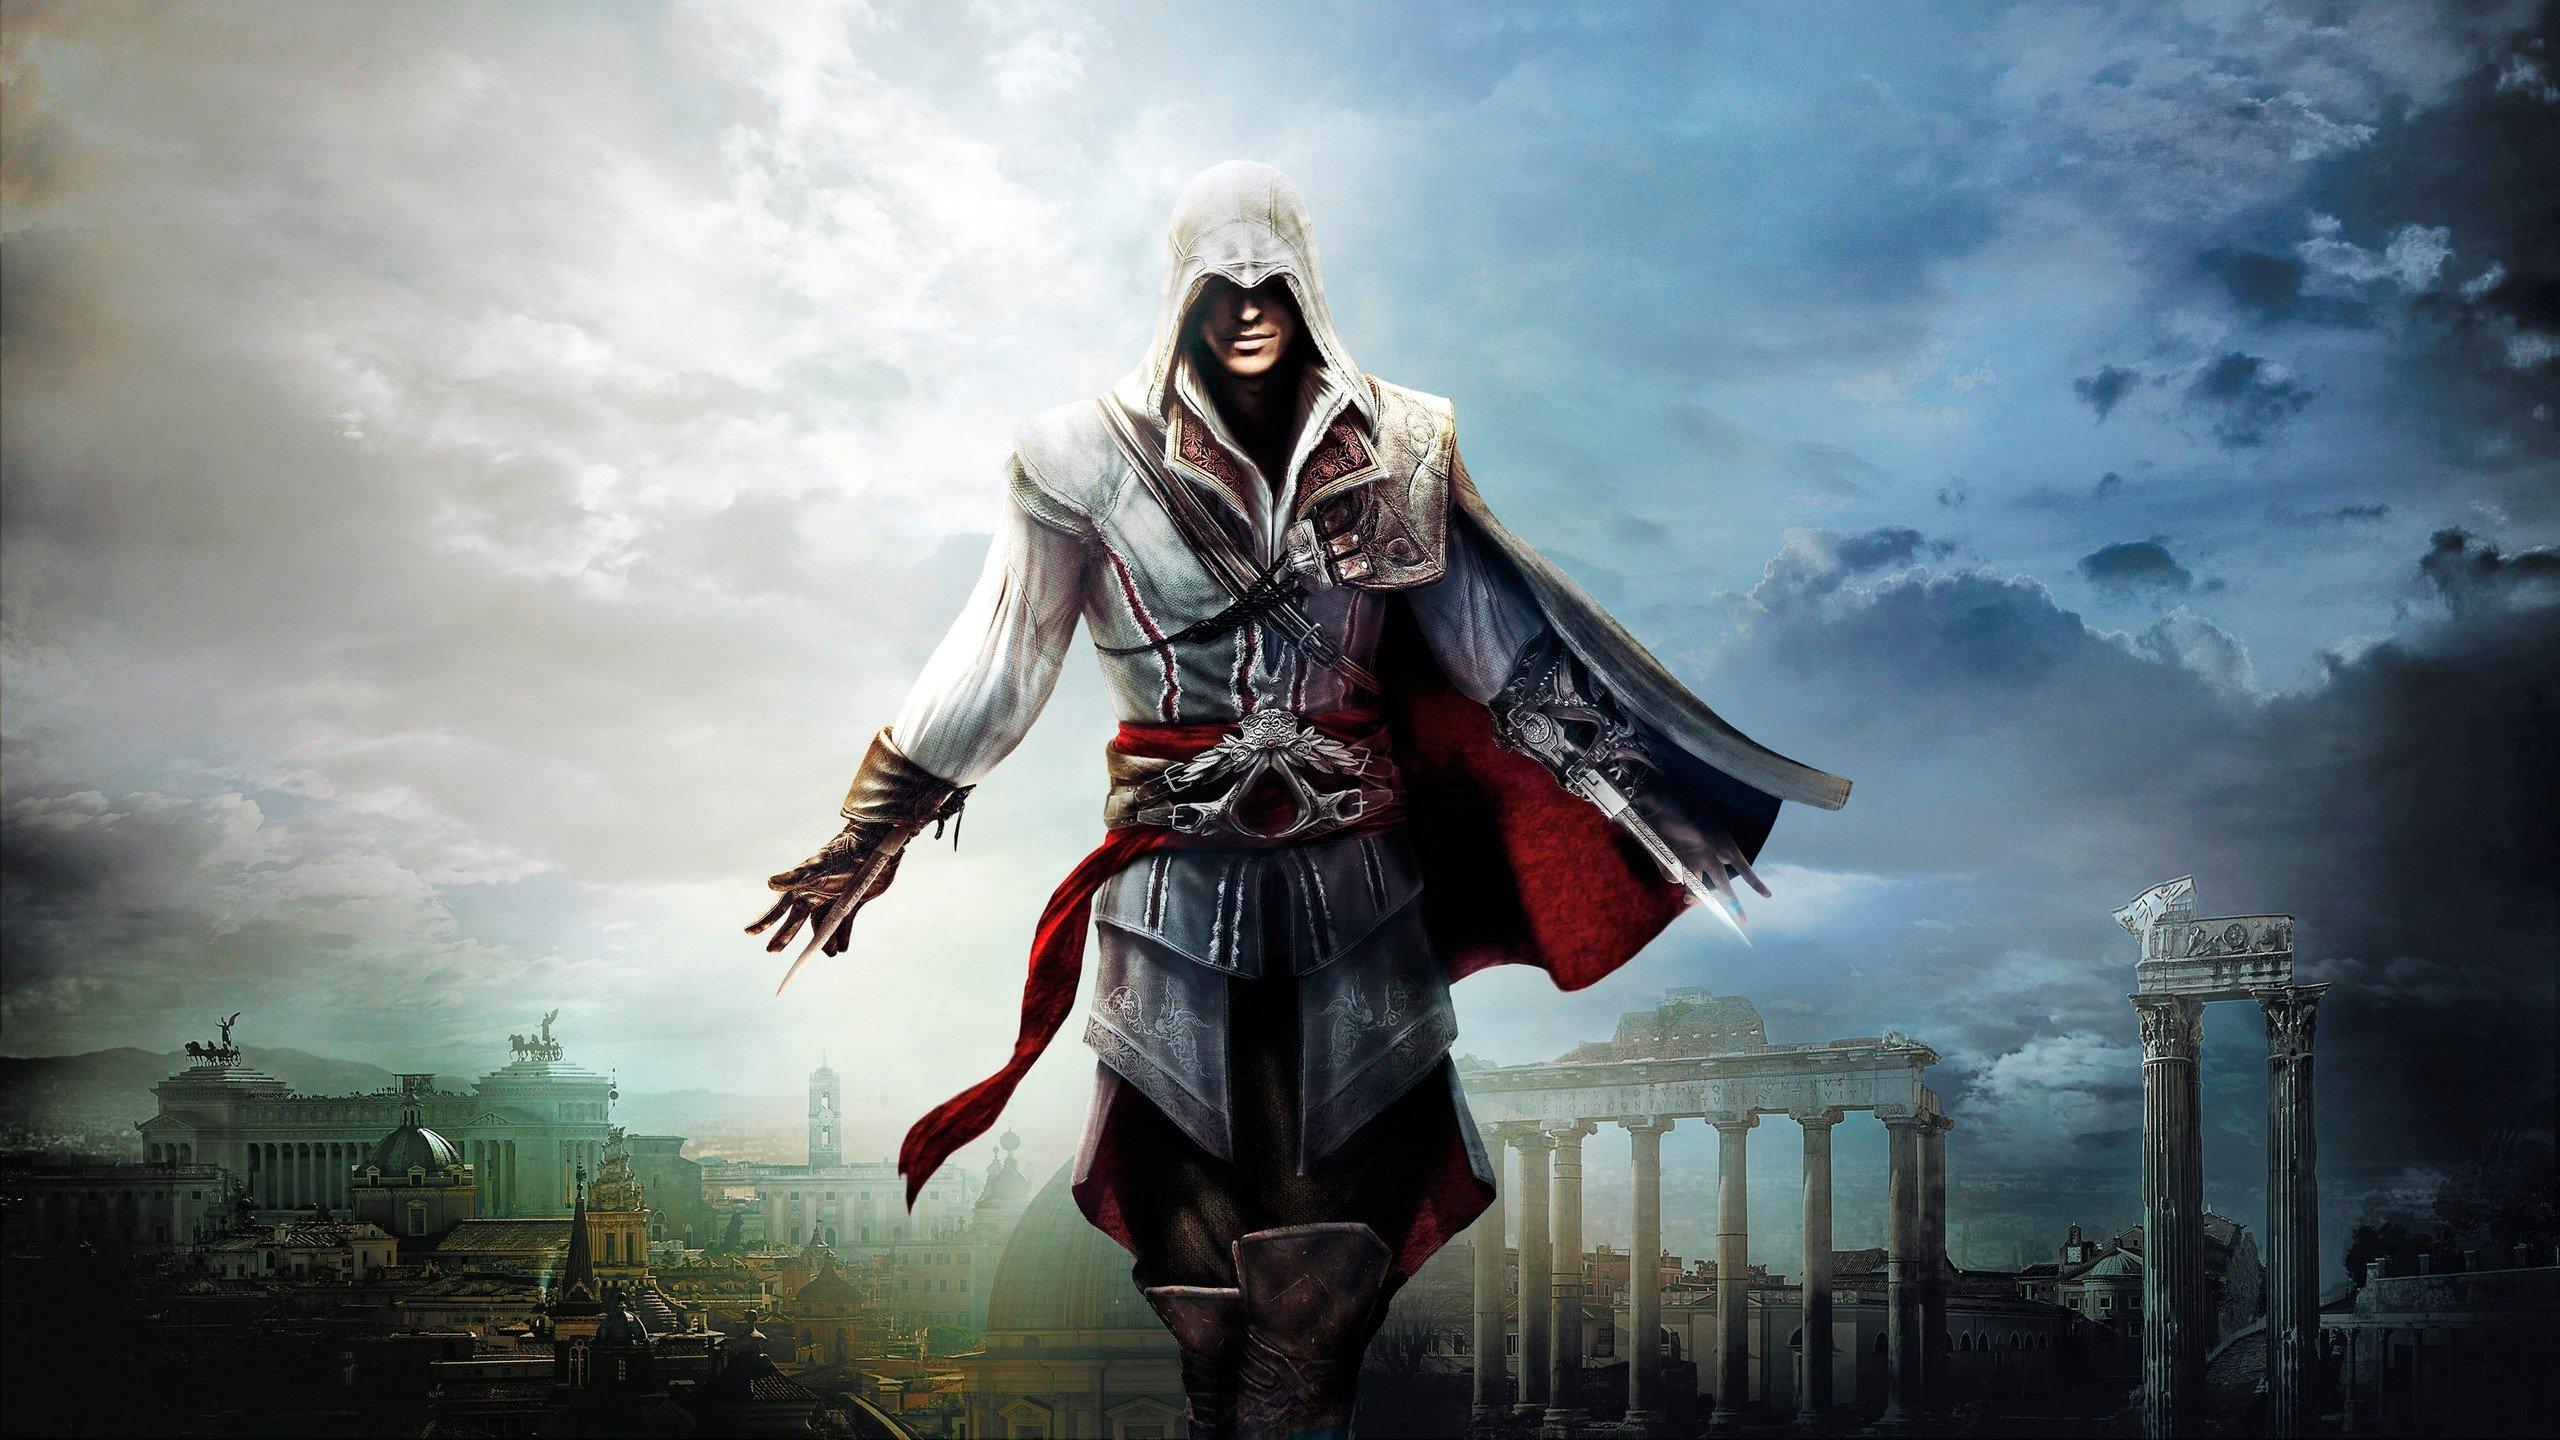 Ezio (Assassin's Creed) Duvar kağıdı